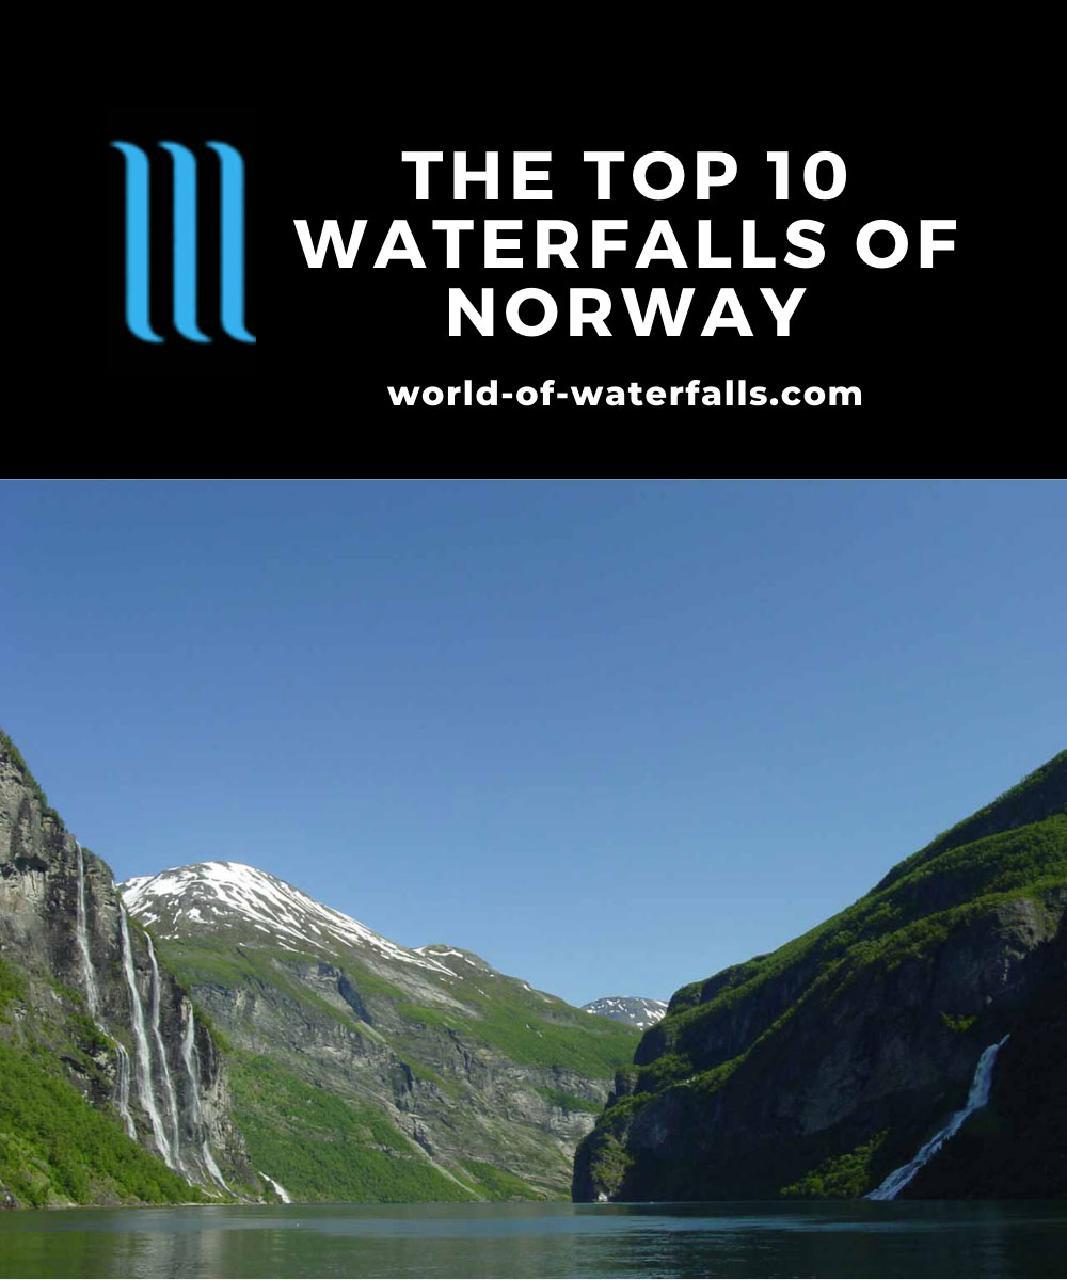 The Top 10 Waterfalls of Norway